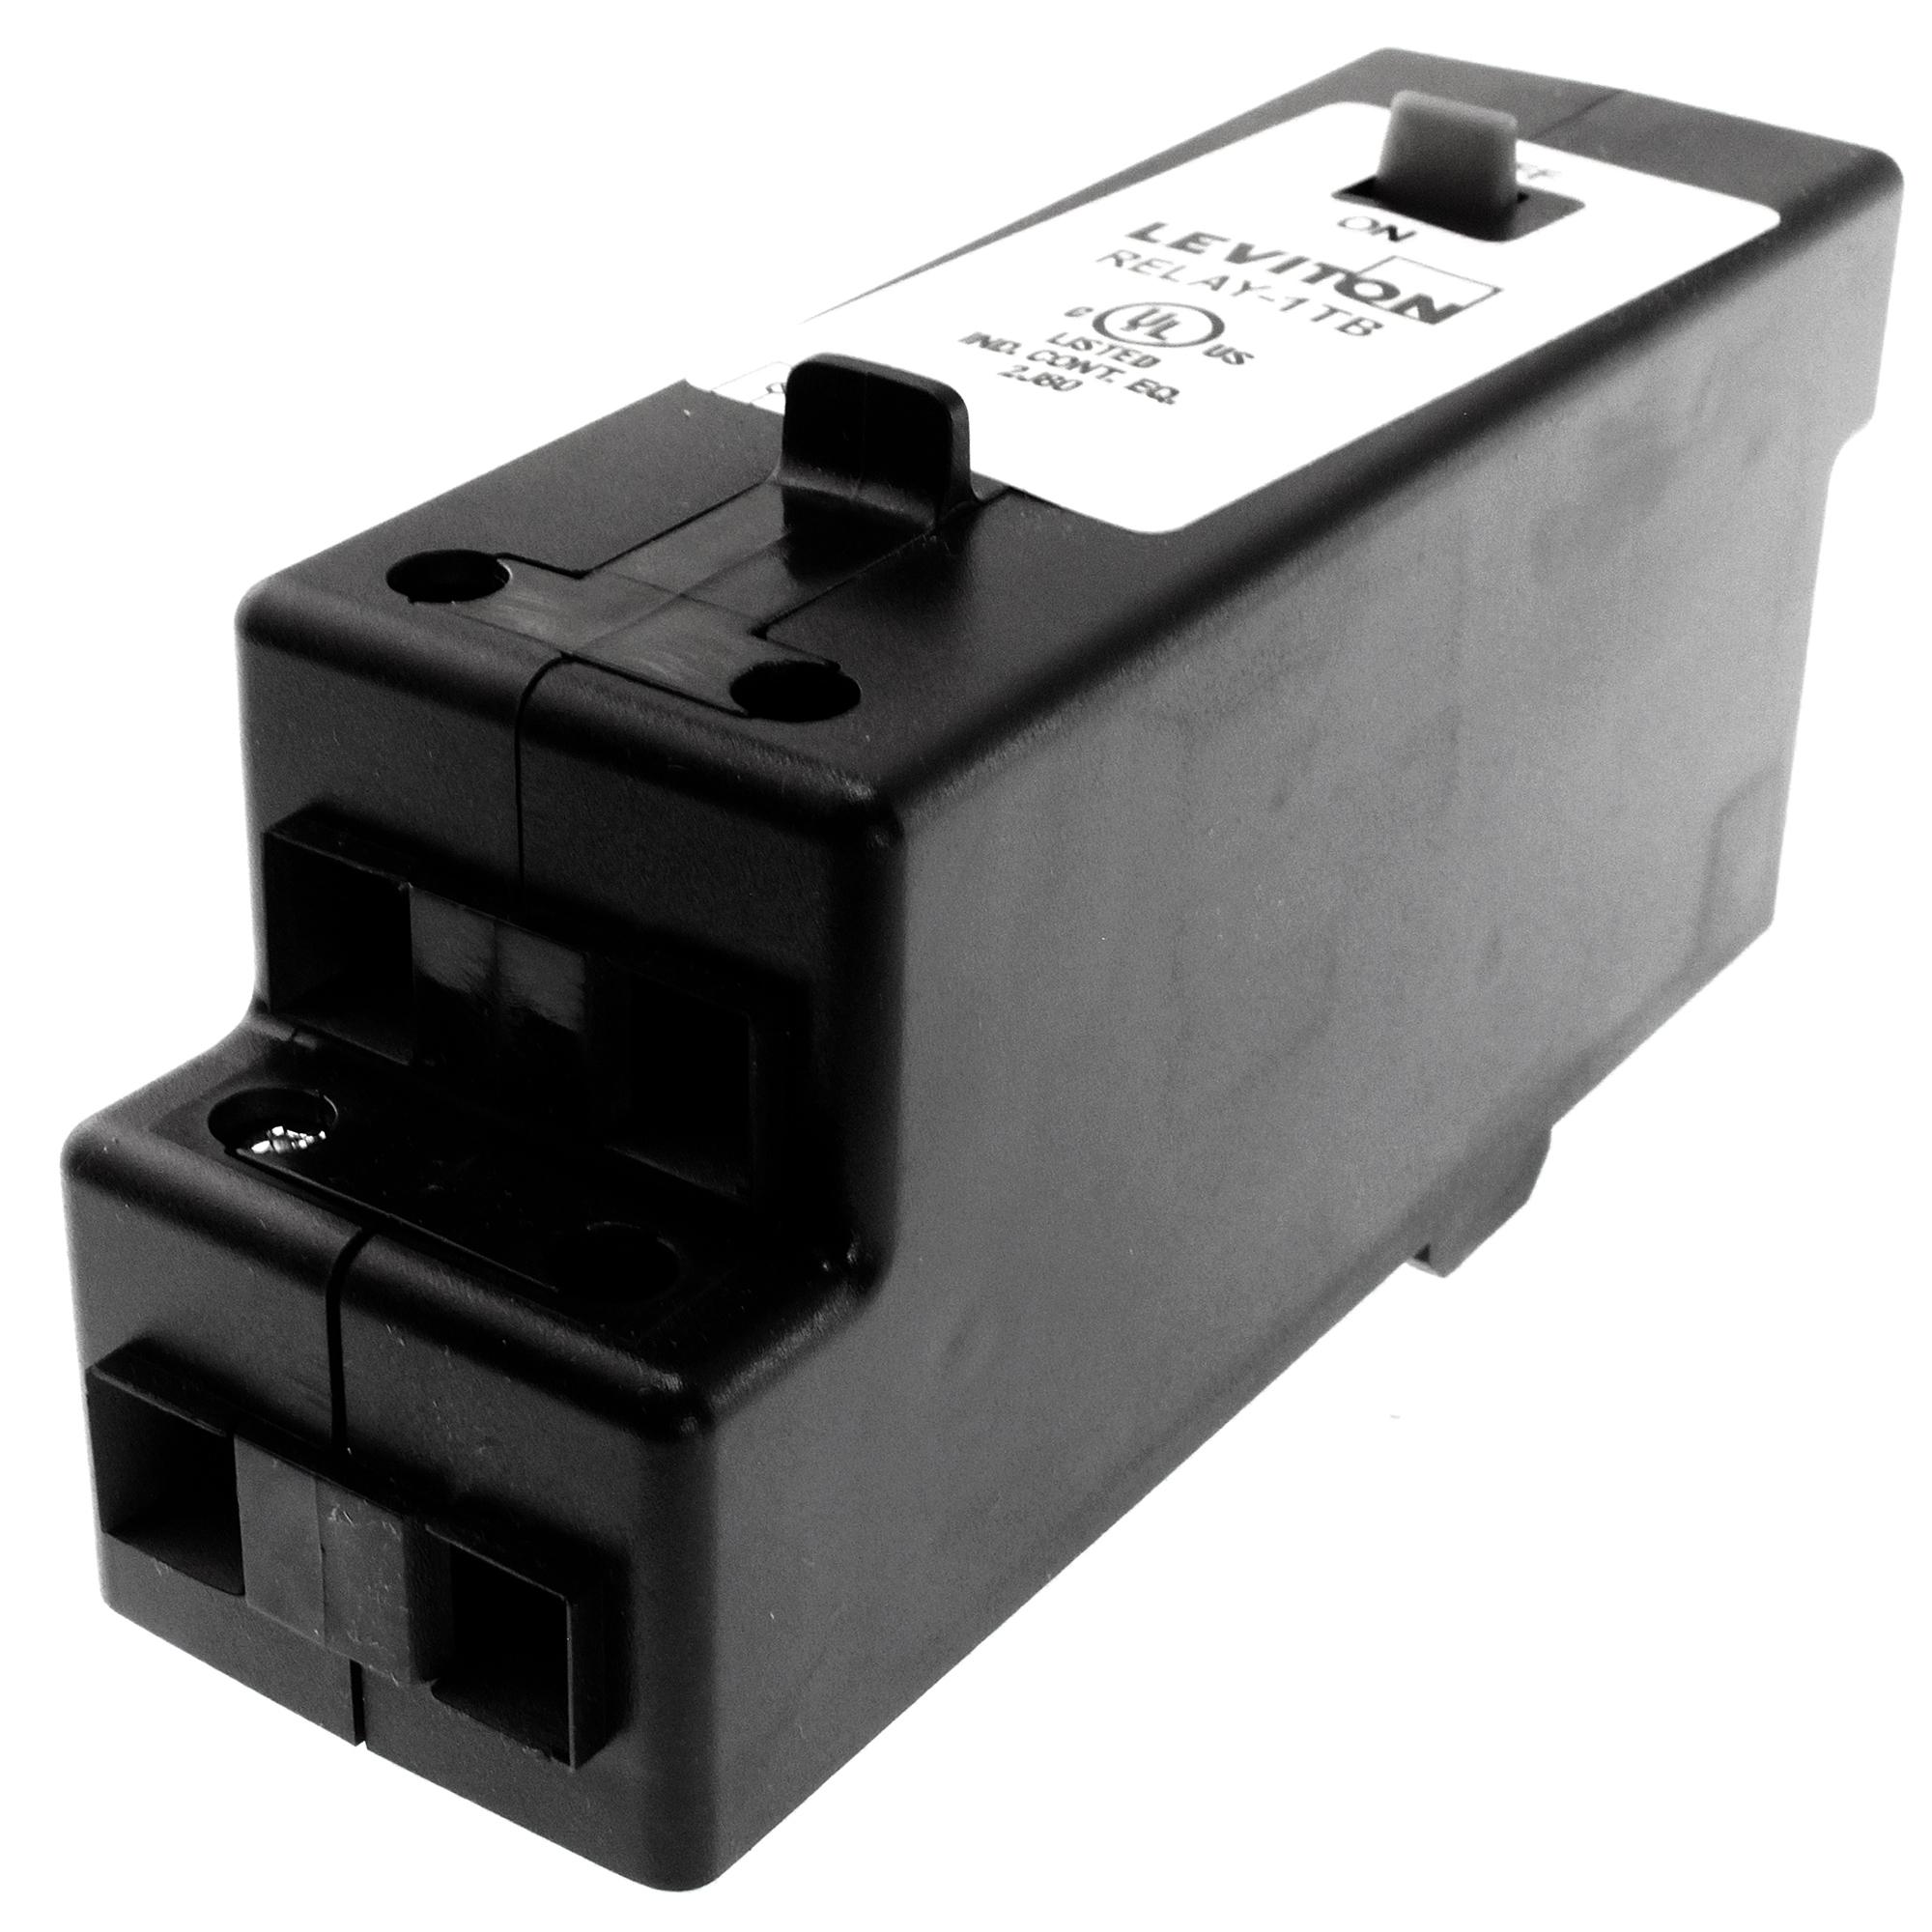 LEVITON RELAY-1TB GREENMAX 1-POLE BASIC LIGHTING CONTROL RELAY ...